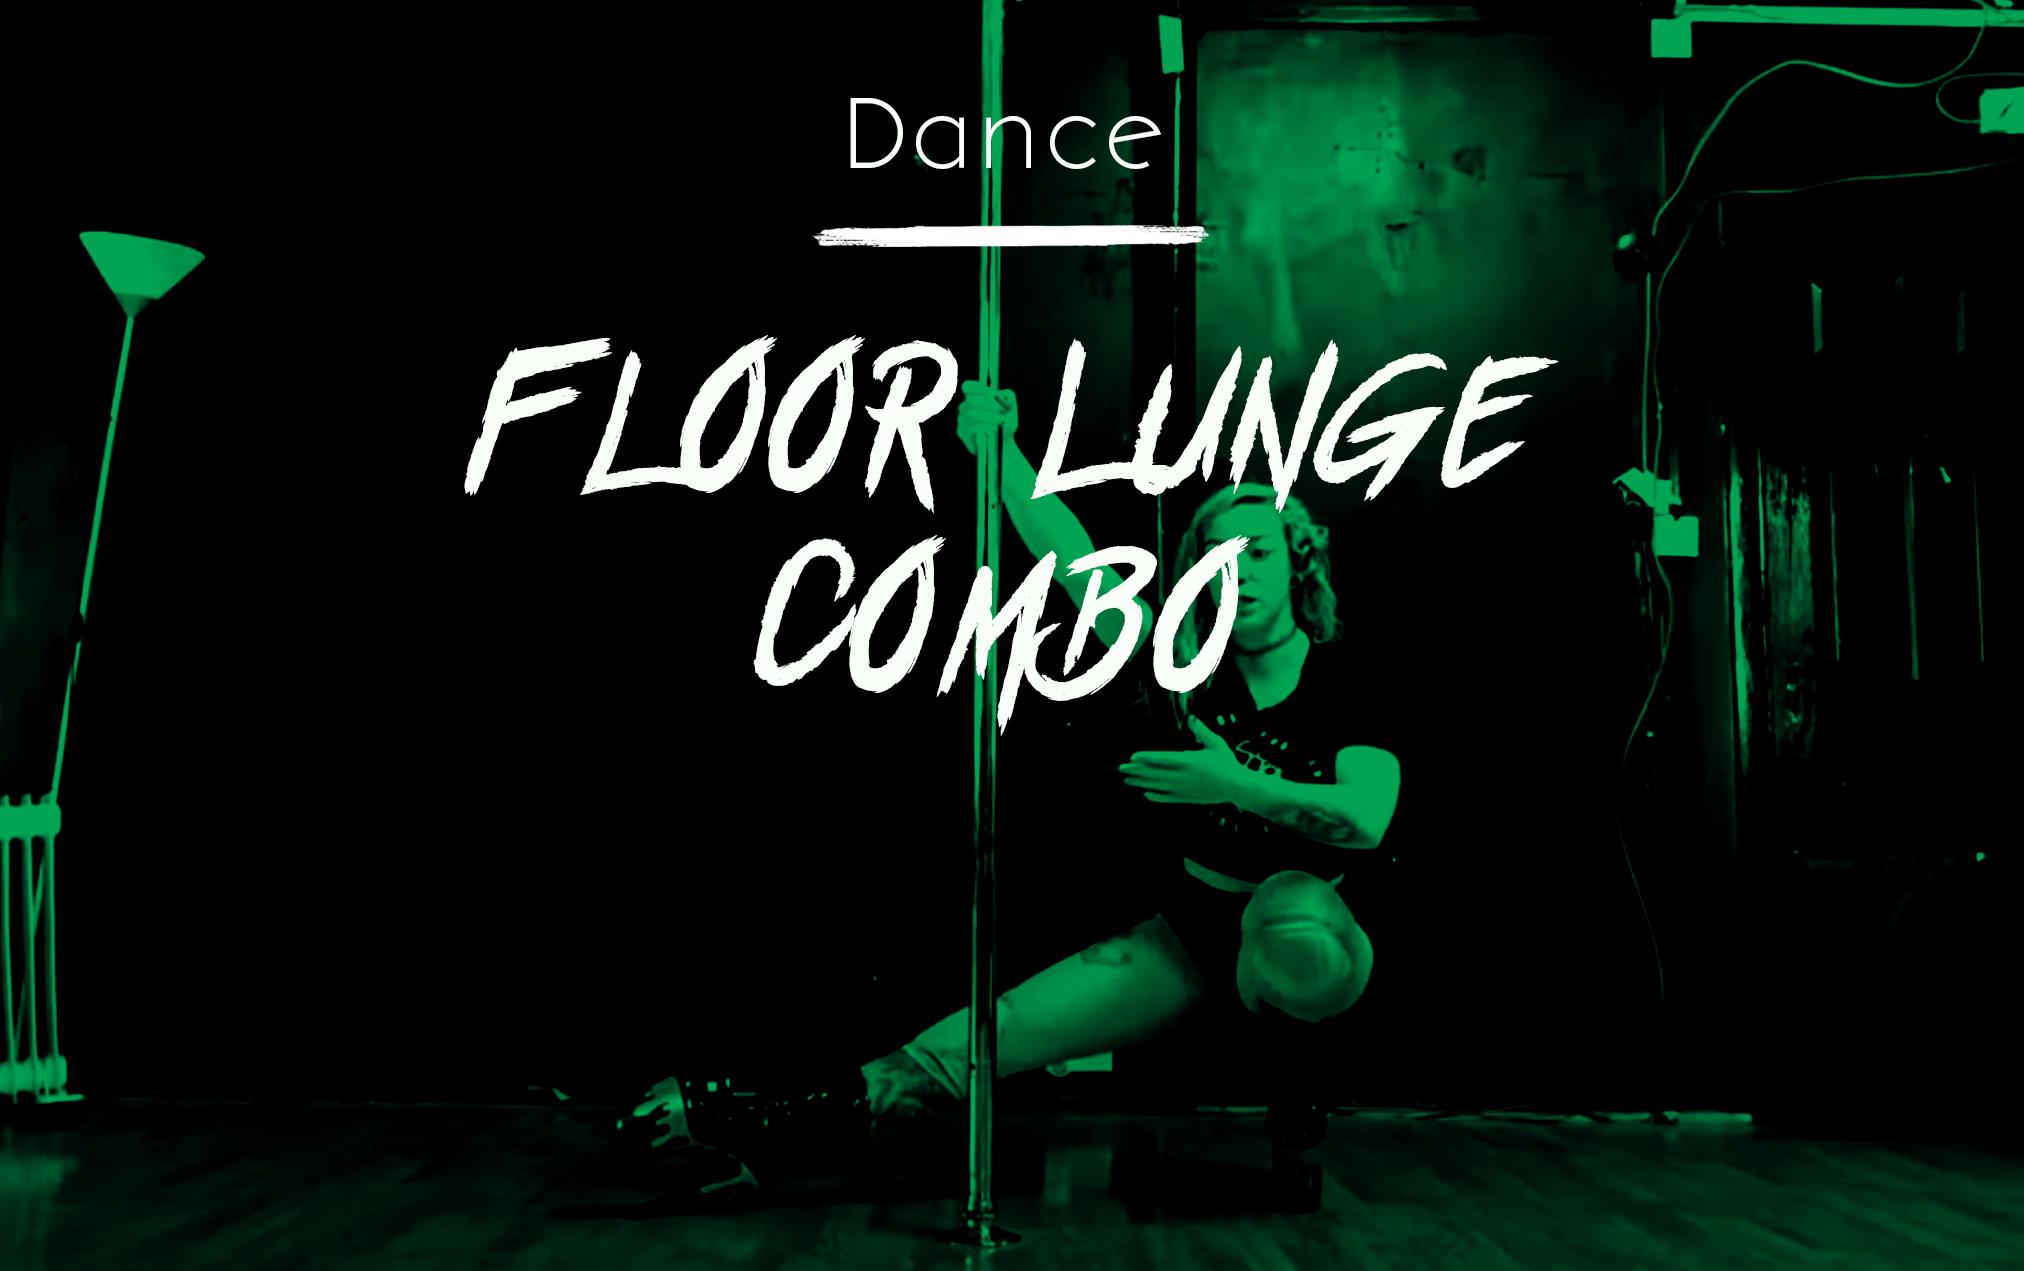 FloorLungecombo